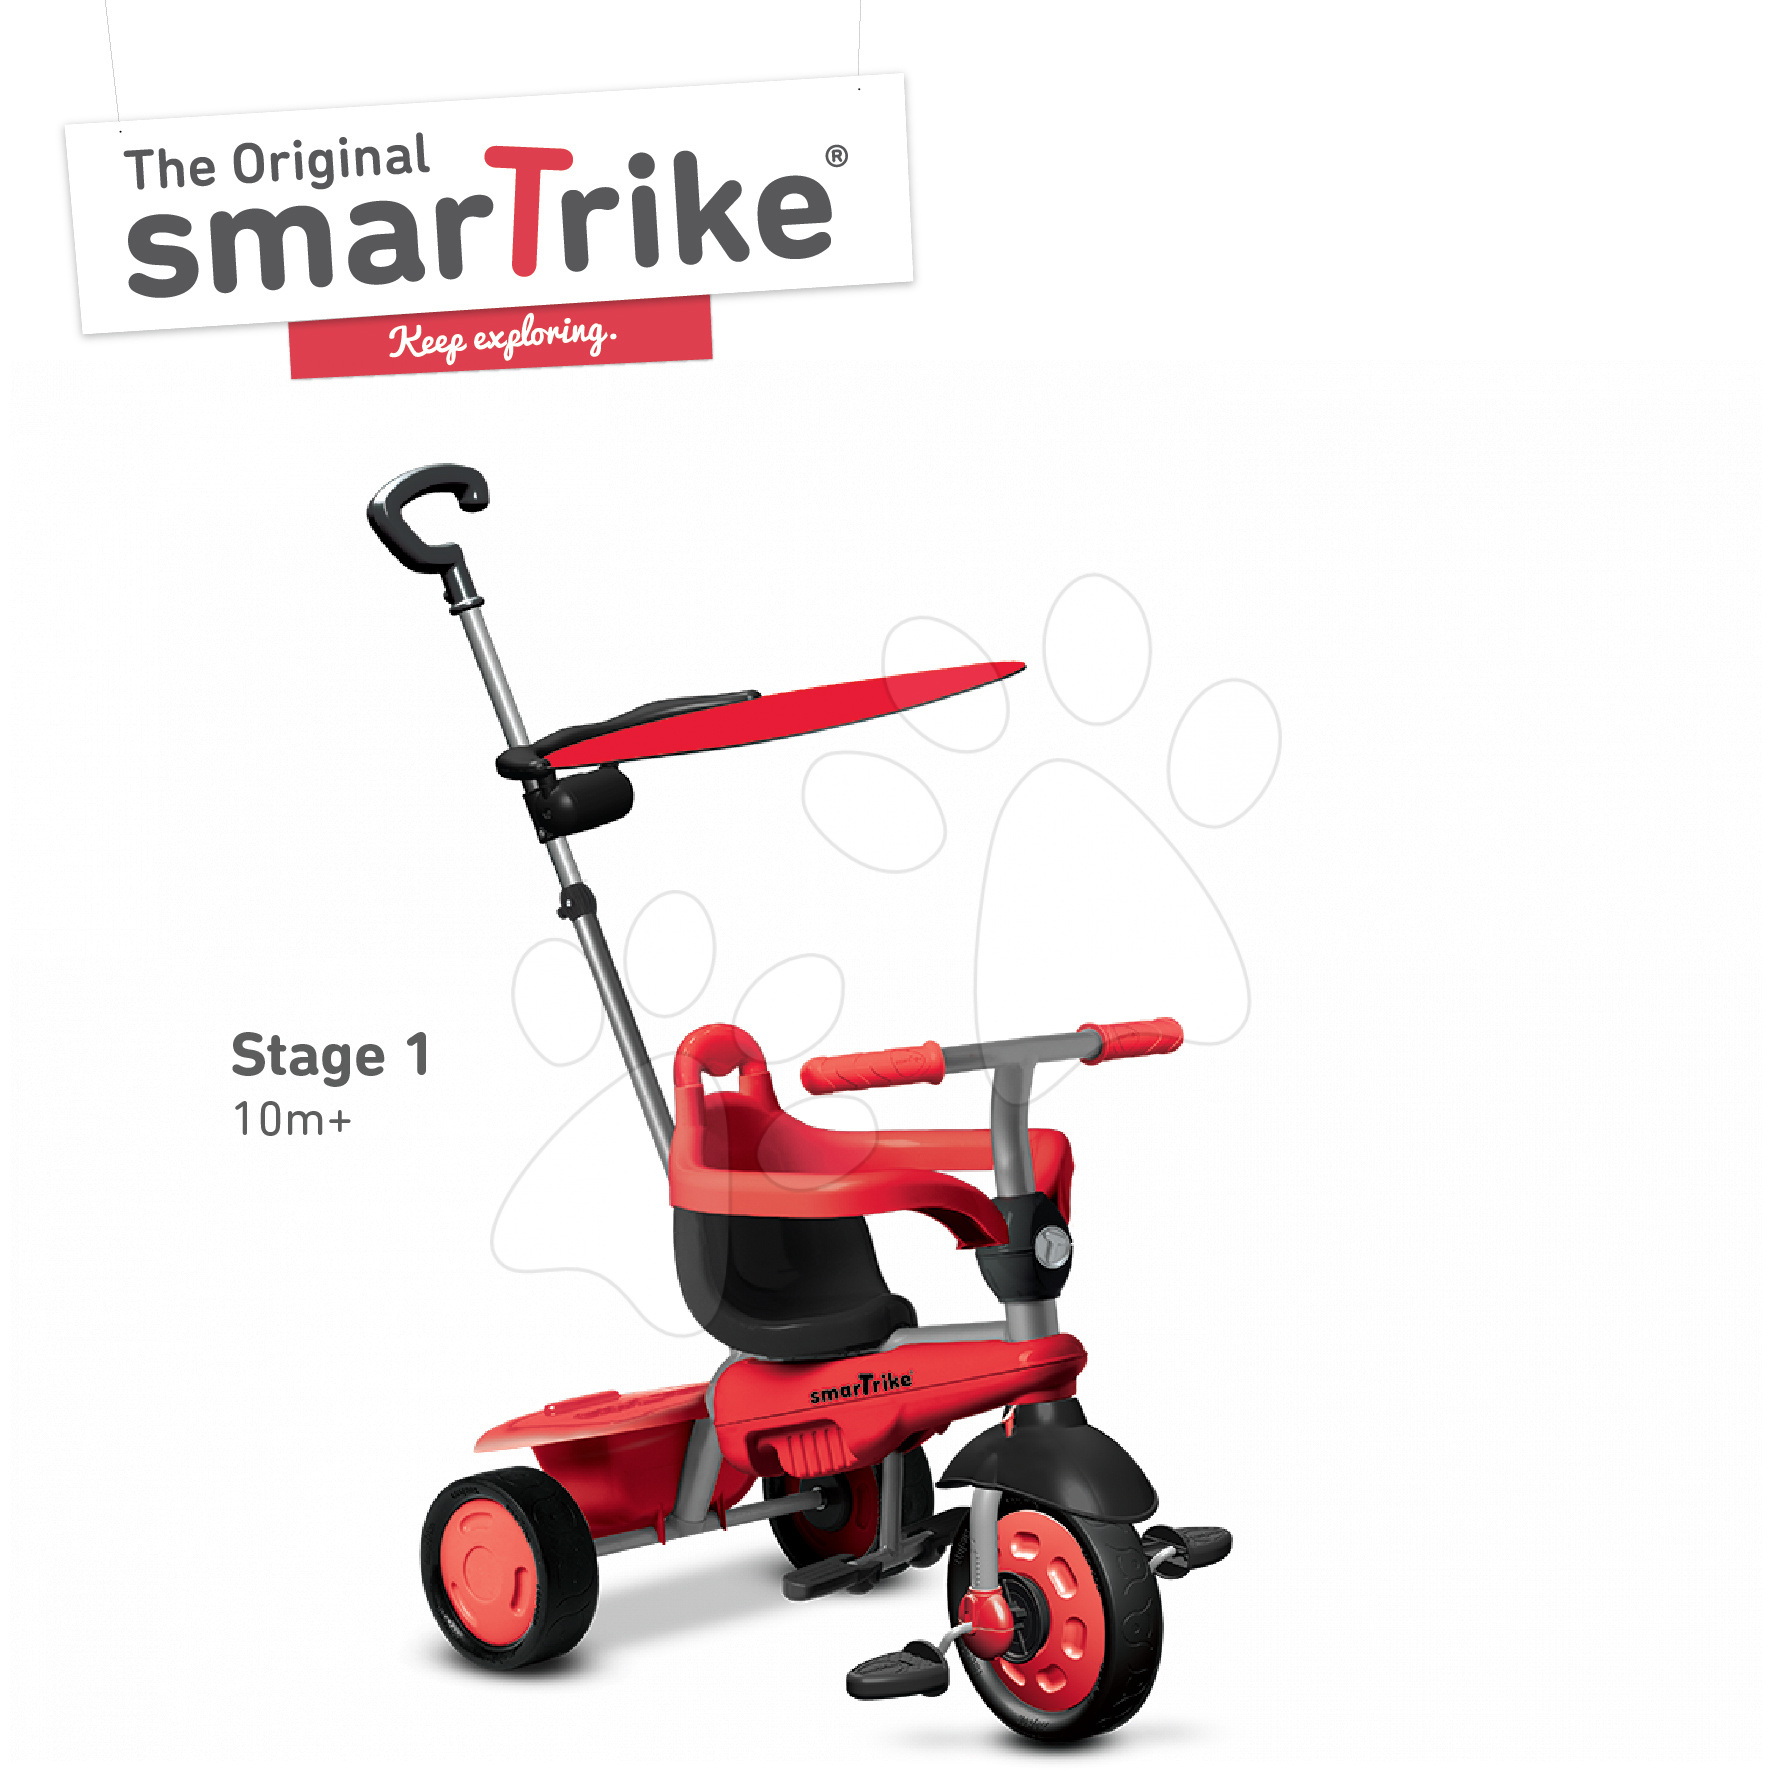 Trojkolky od 10 mesiacov - Trojkolka Carnival Red Touch Steering smarTrike 3v1 červeno-šedá od 10 mes